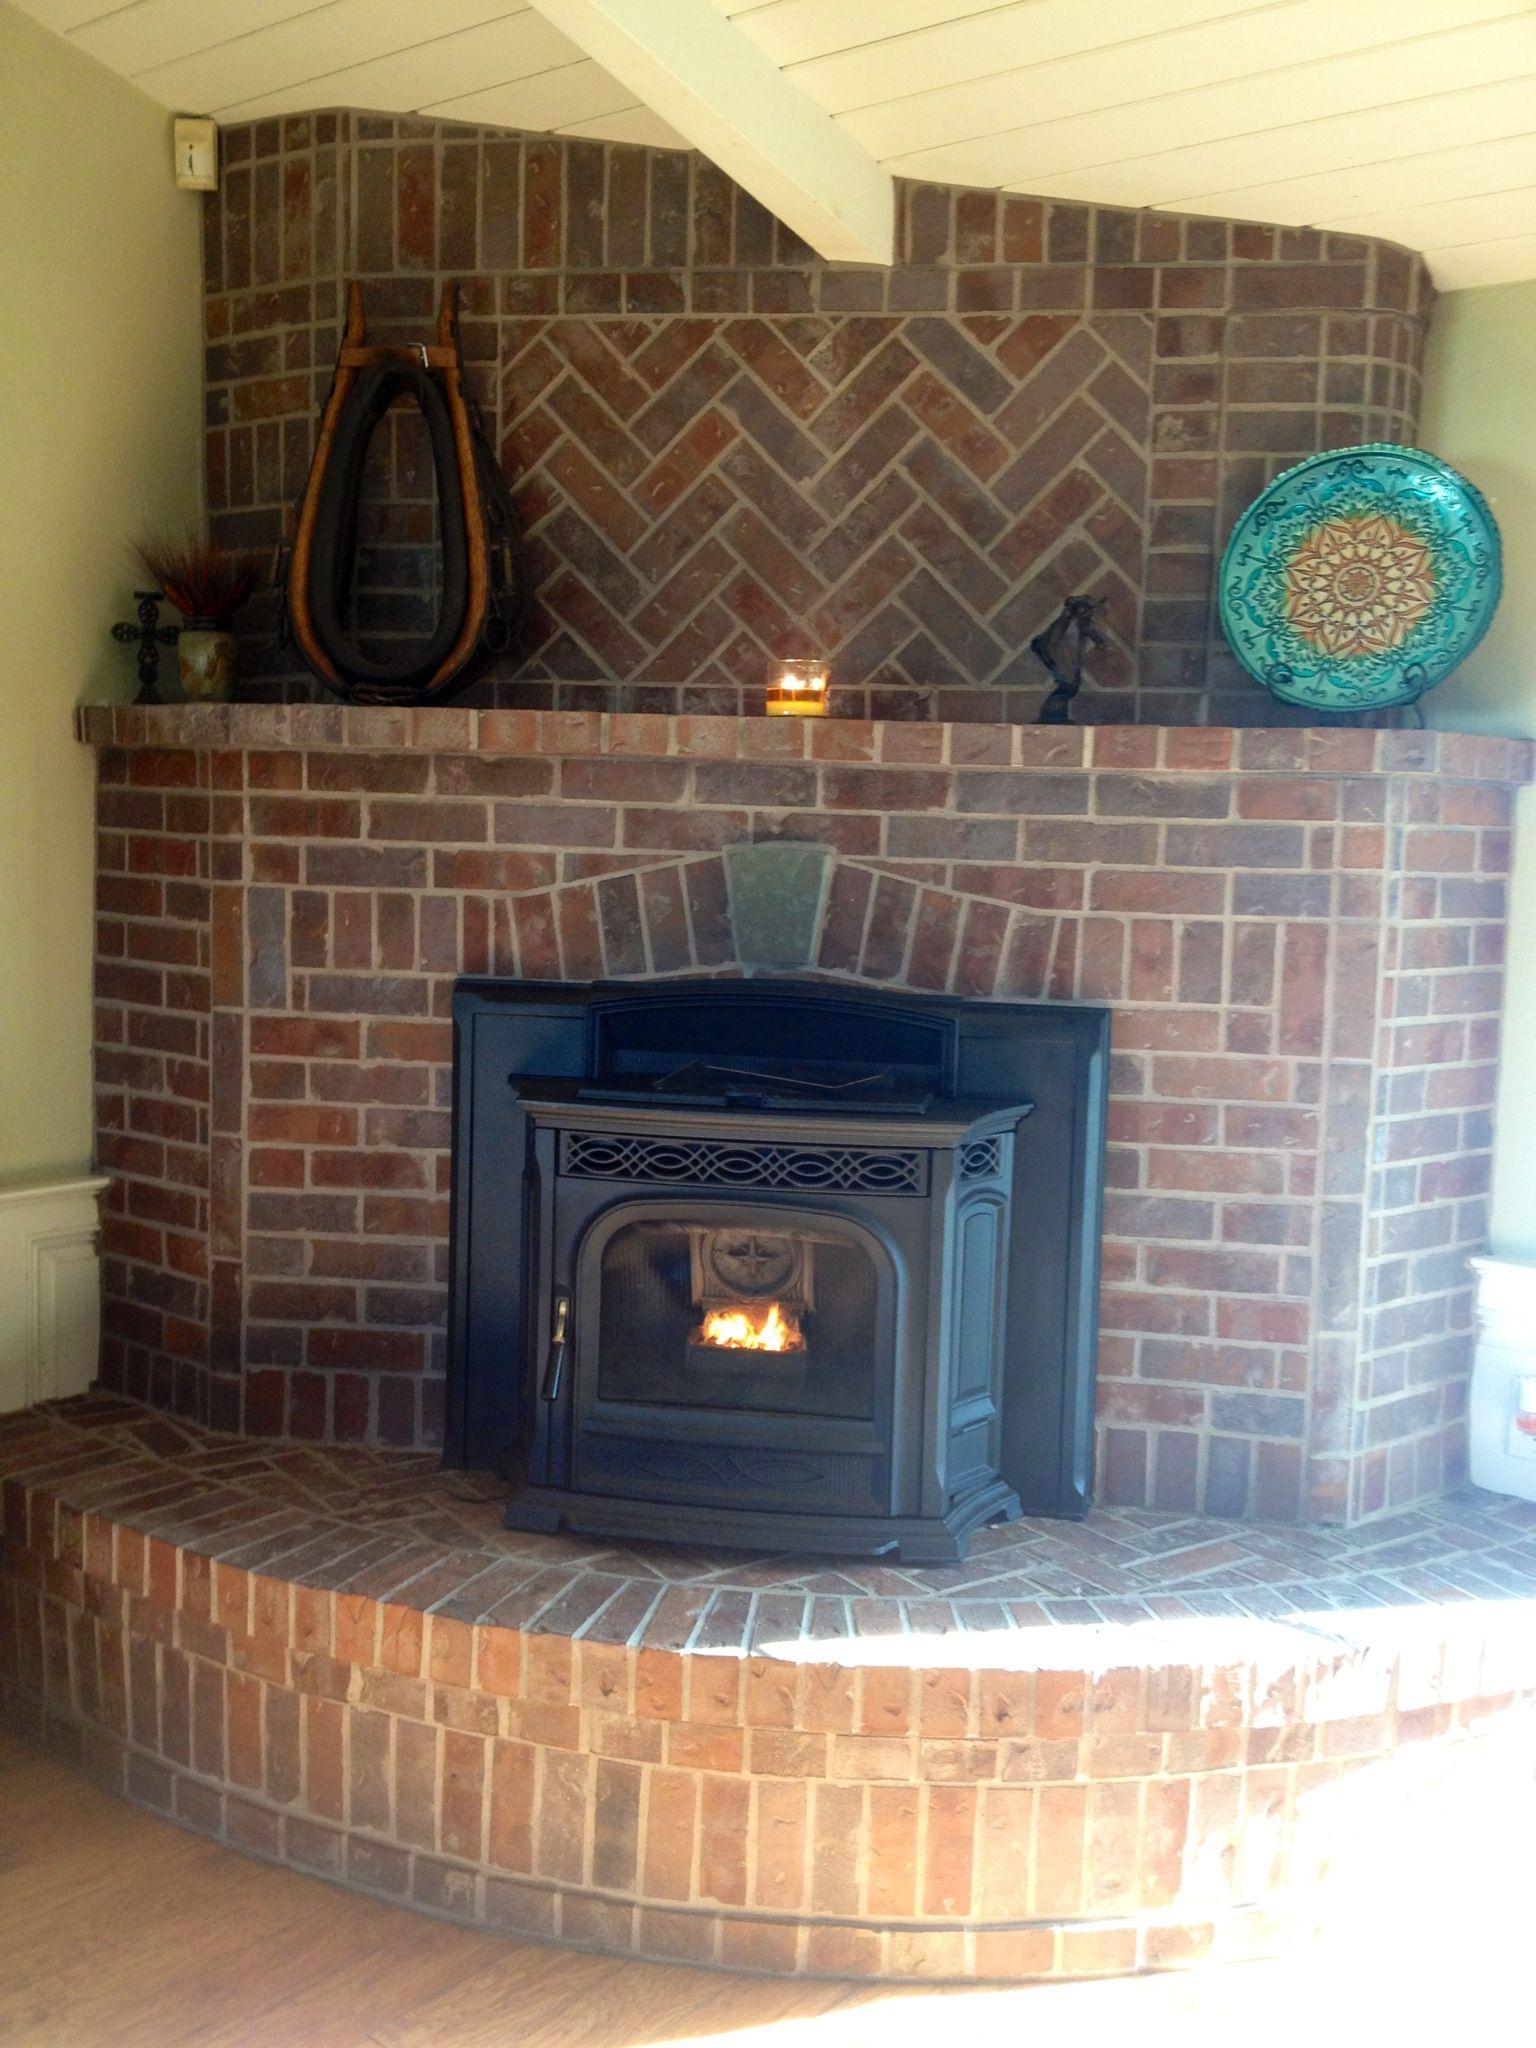 Prime Brick Fireplace Corner Placement Red Brick Herringbone Home Interior And Landscaping Transignezvosmurscom